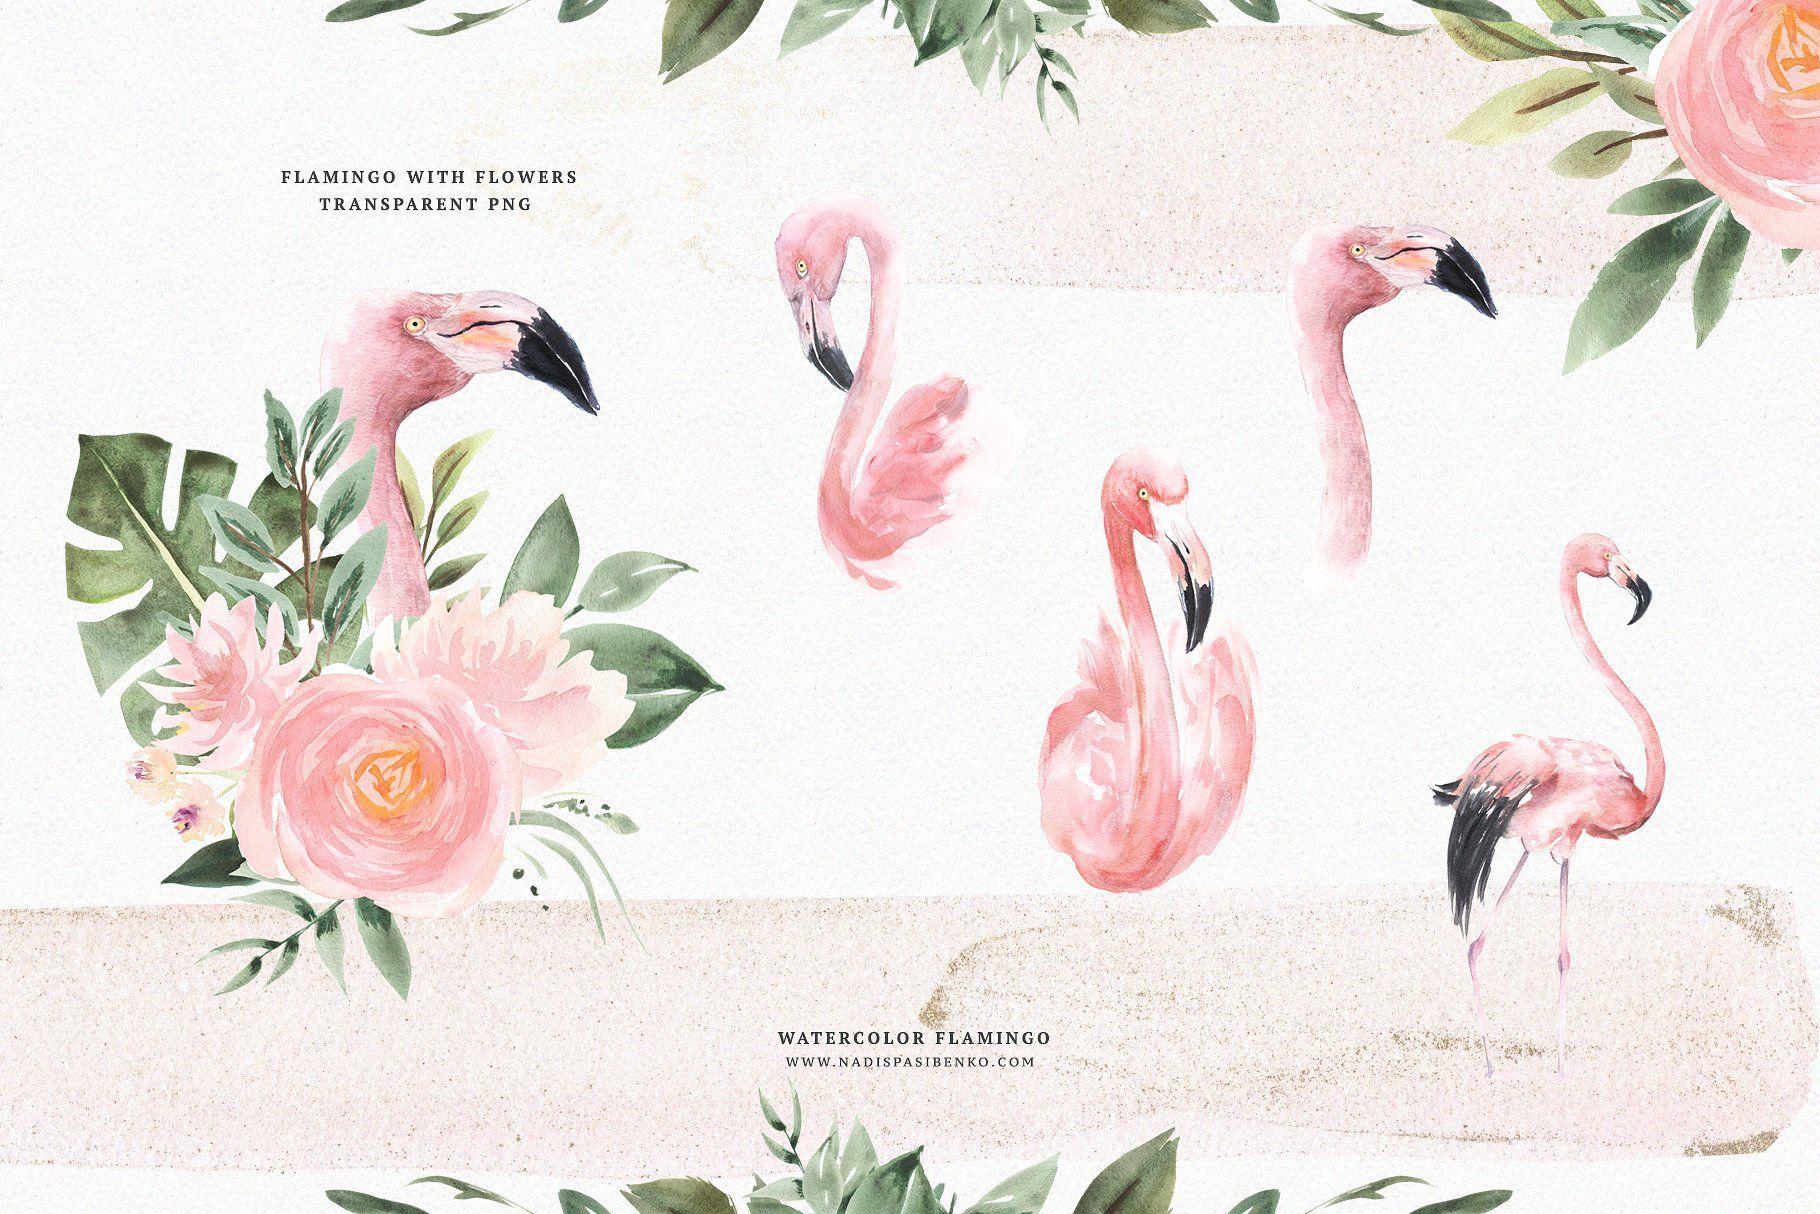 Watercolor Flamingo Flowers Watercolor Illustration Flamingo Flower Flamingo